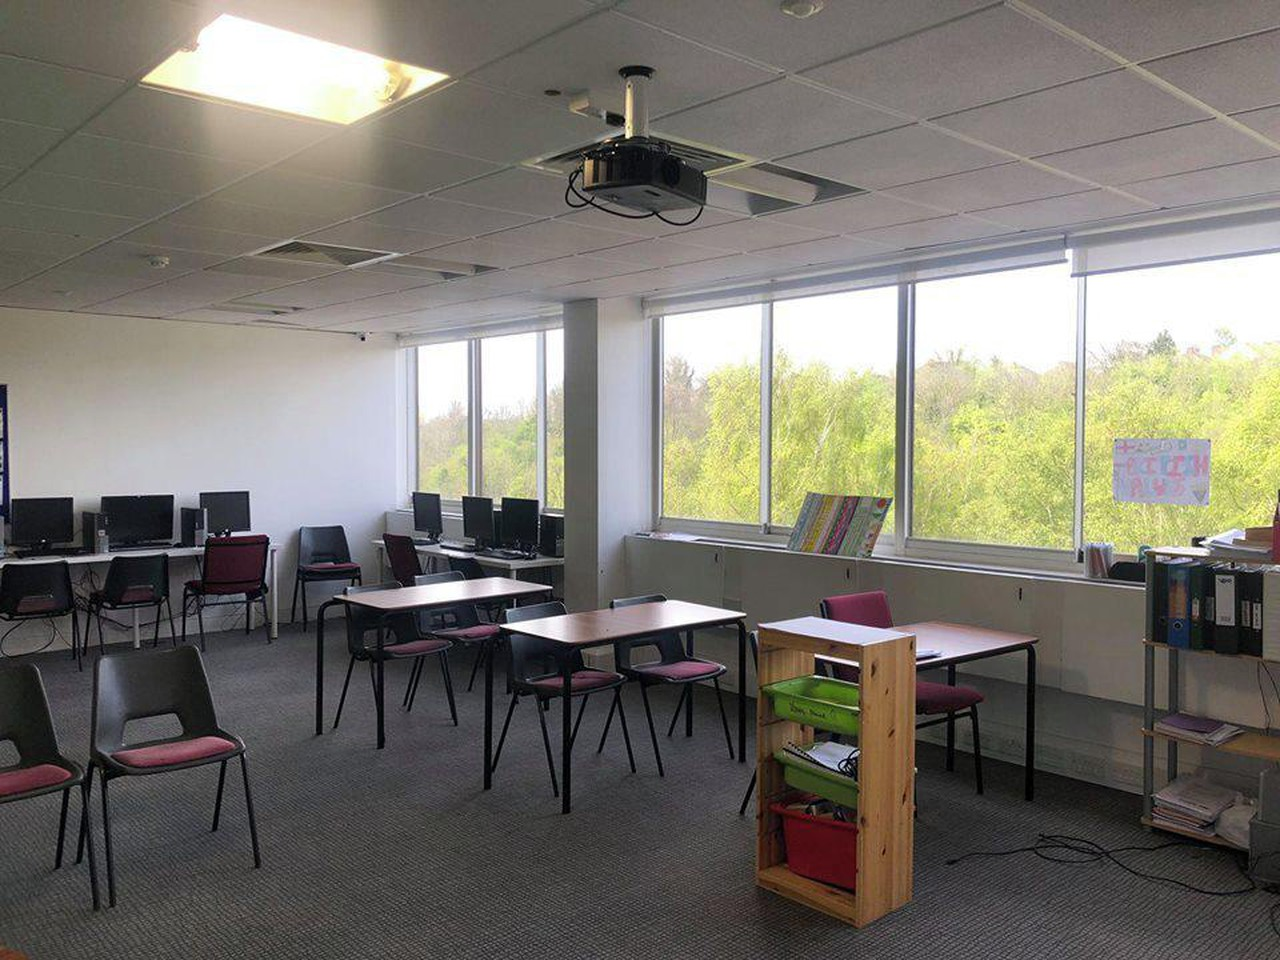 Londen training rooms Vergaderruimte meeting space 4 image 0